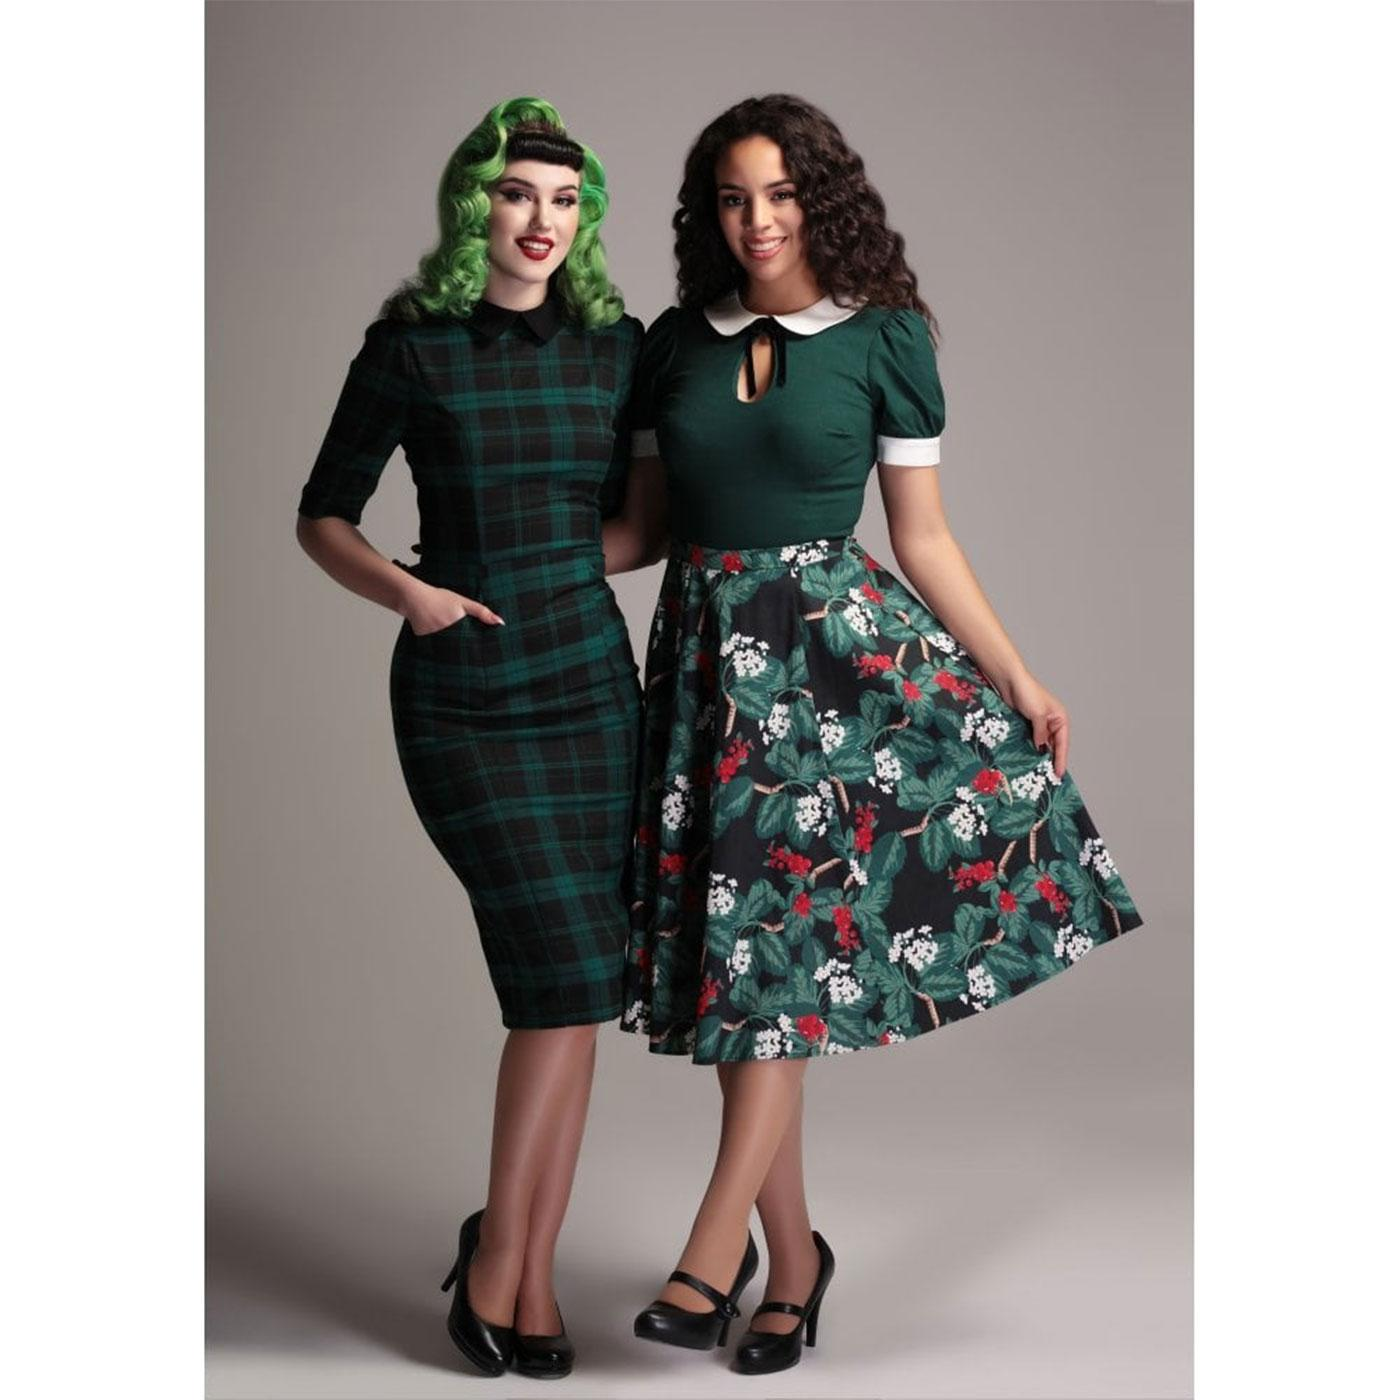 6c697ce8baee Winona COLLECTIF Tartan 1950s Pencil Dress Green